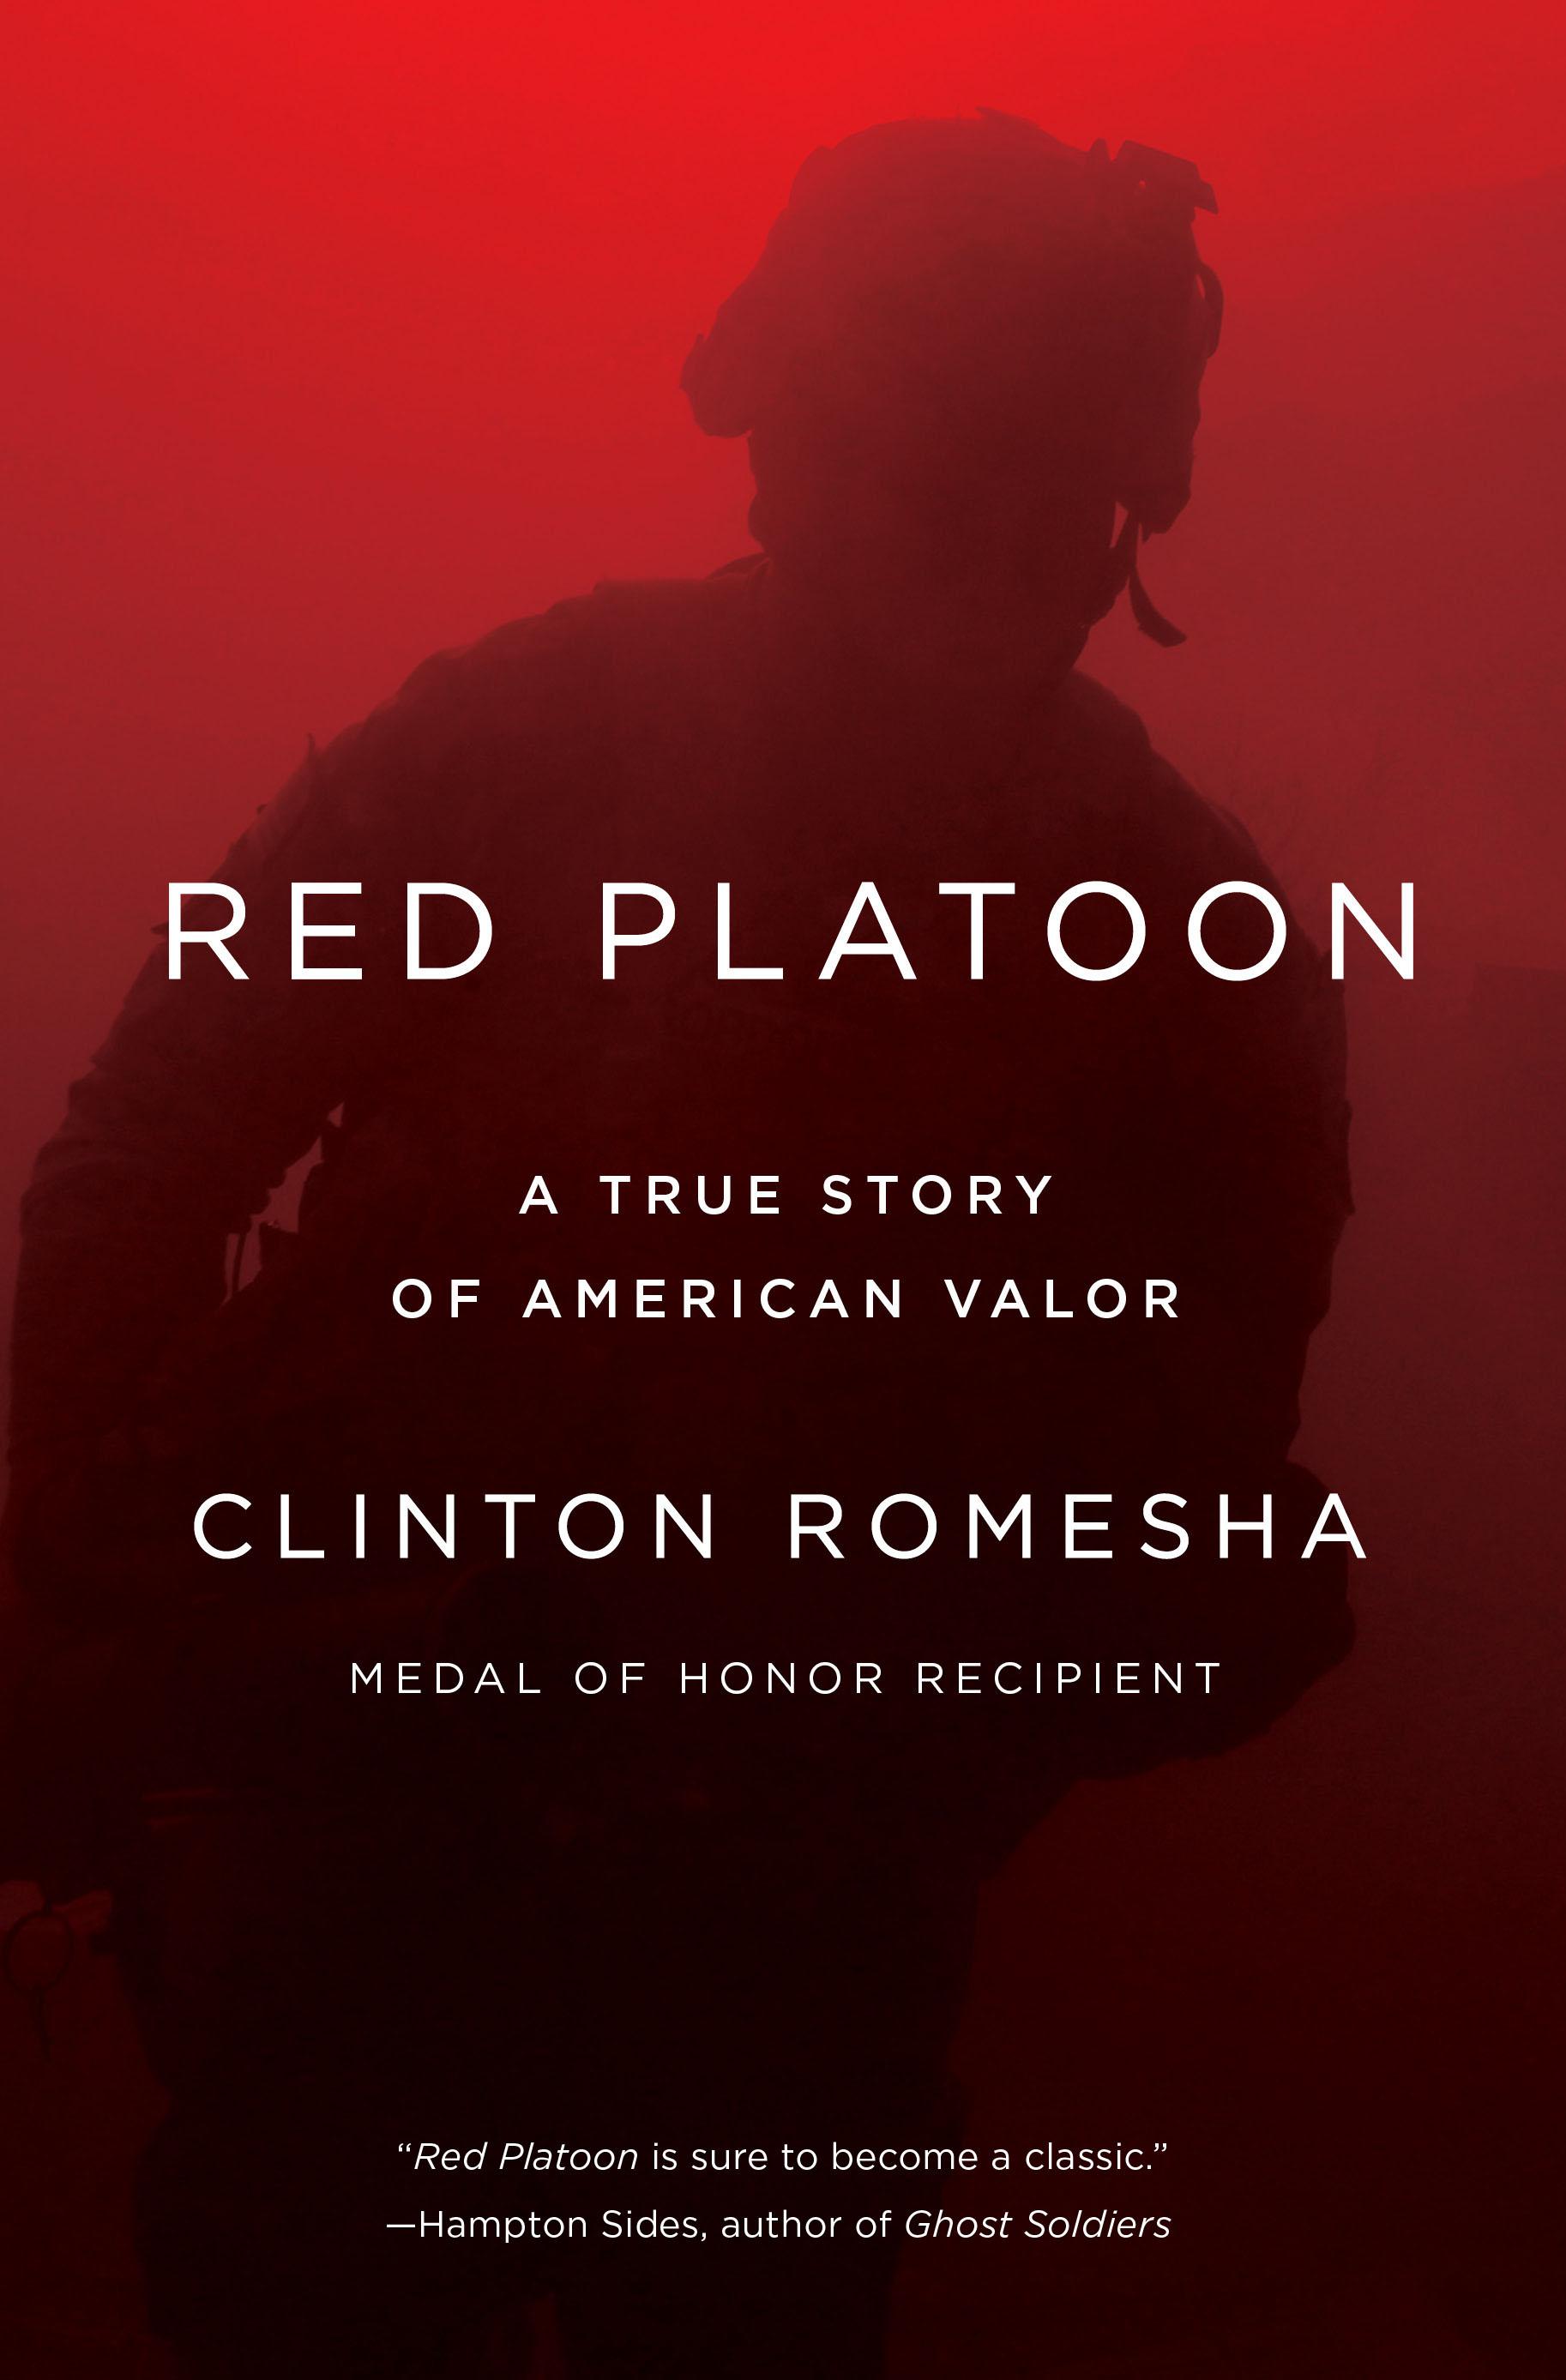 635999666729829236-Red-Platoon.JPG